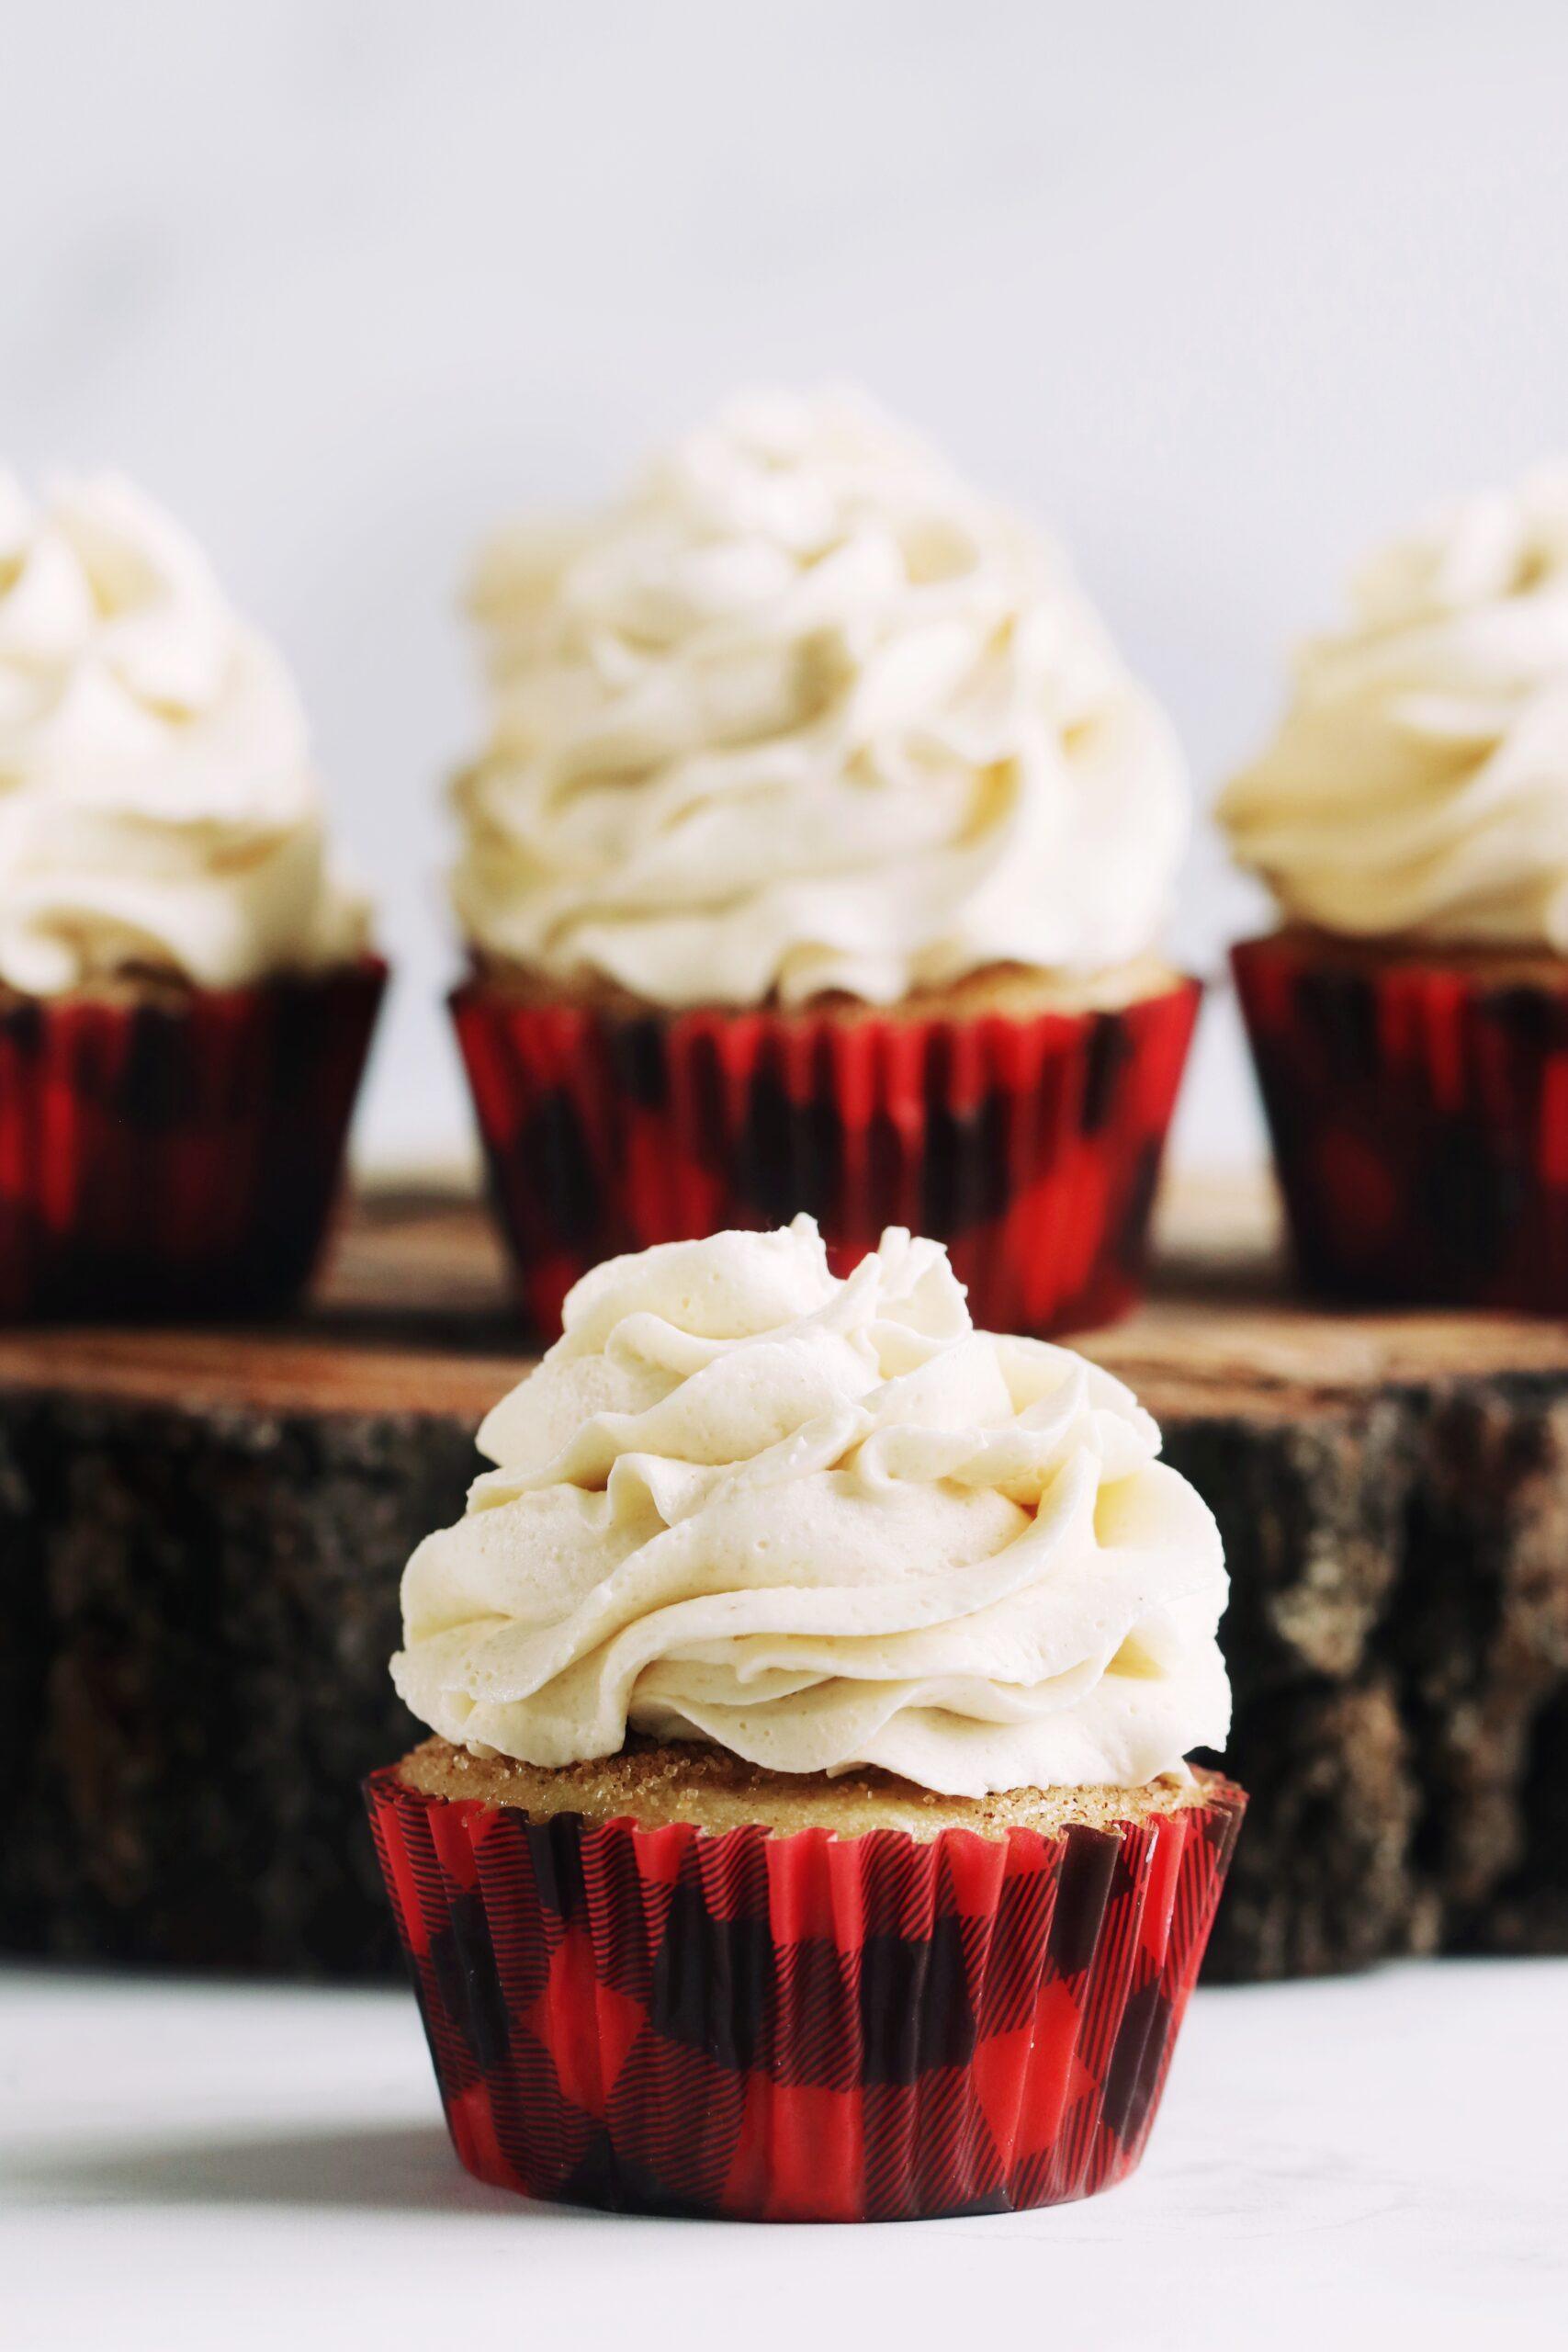 Vegan Coffee Cake Cupcakes {with Brown Sugar Cinnamon Frosting}